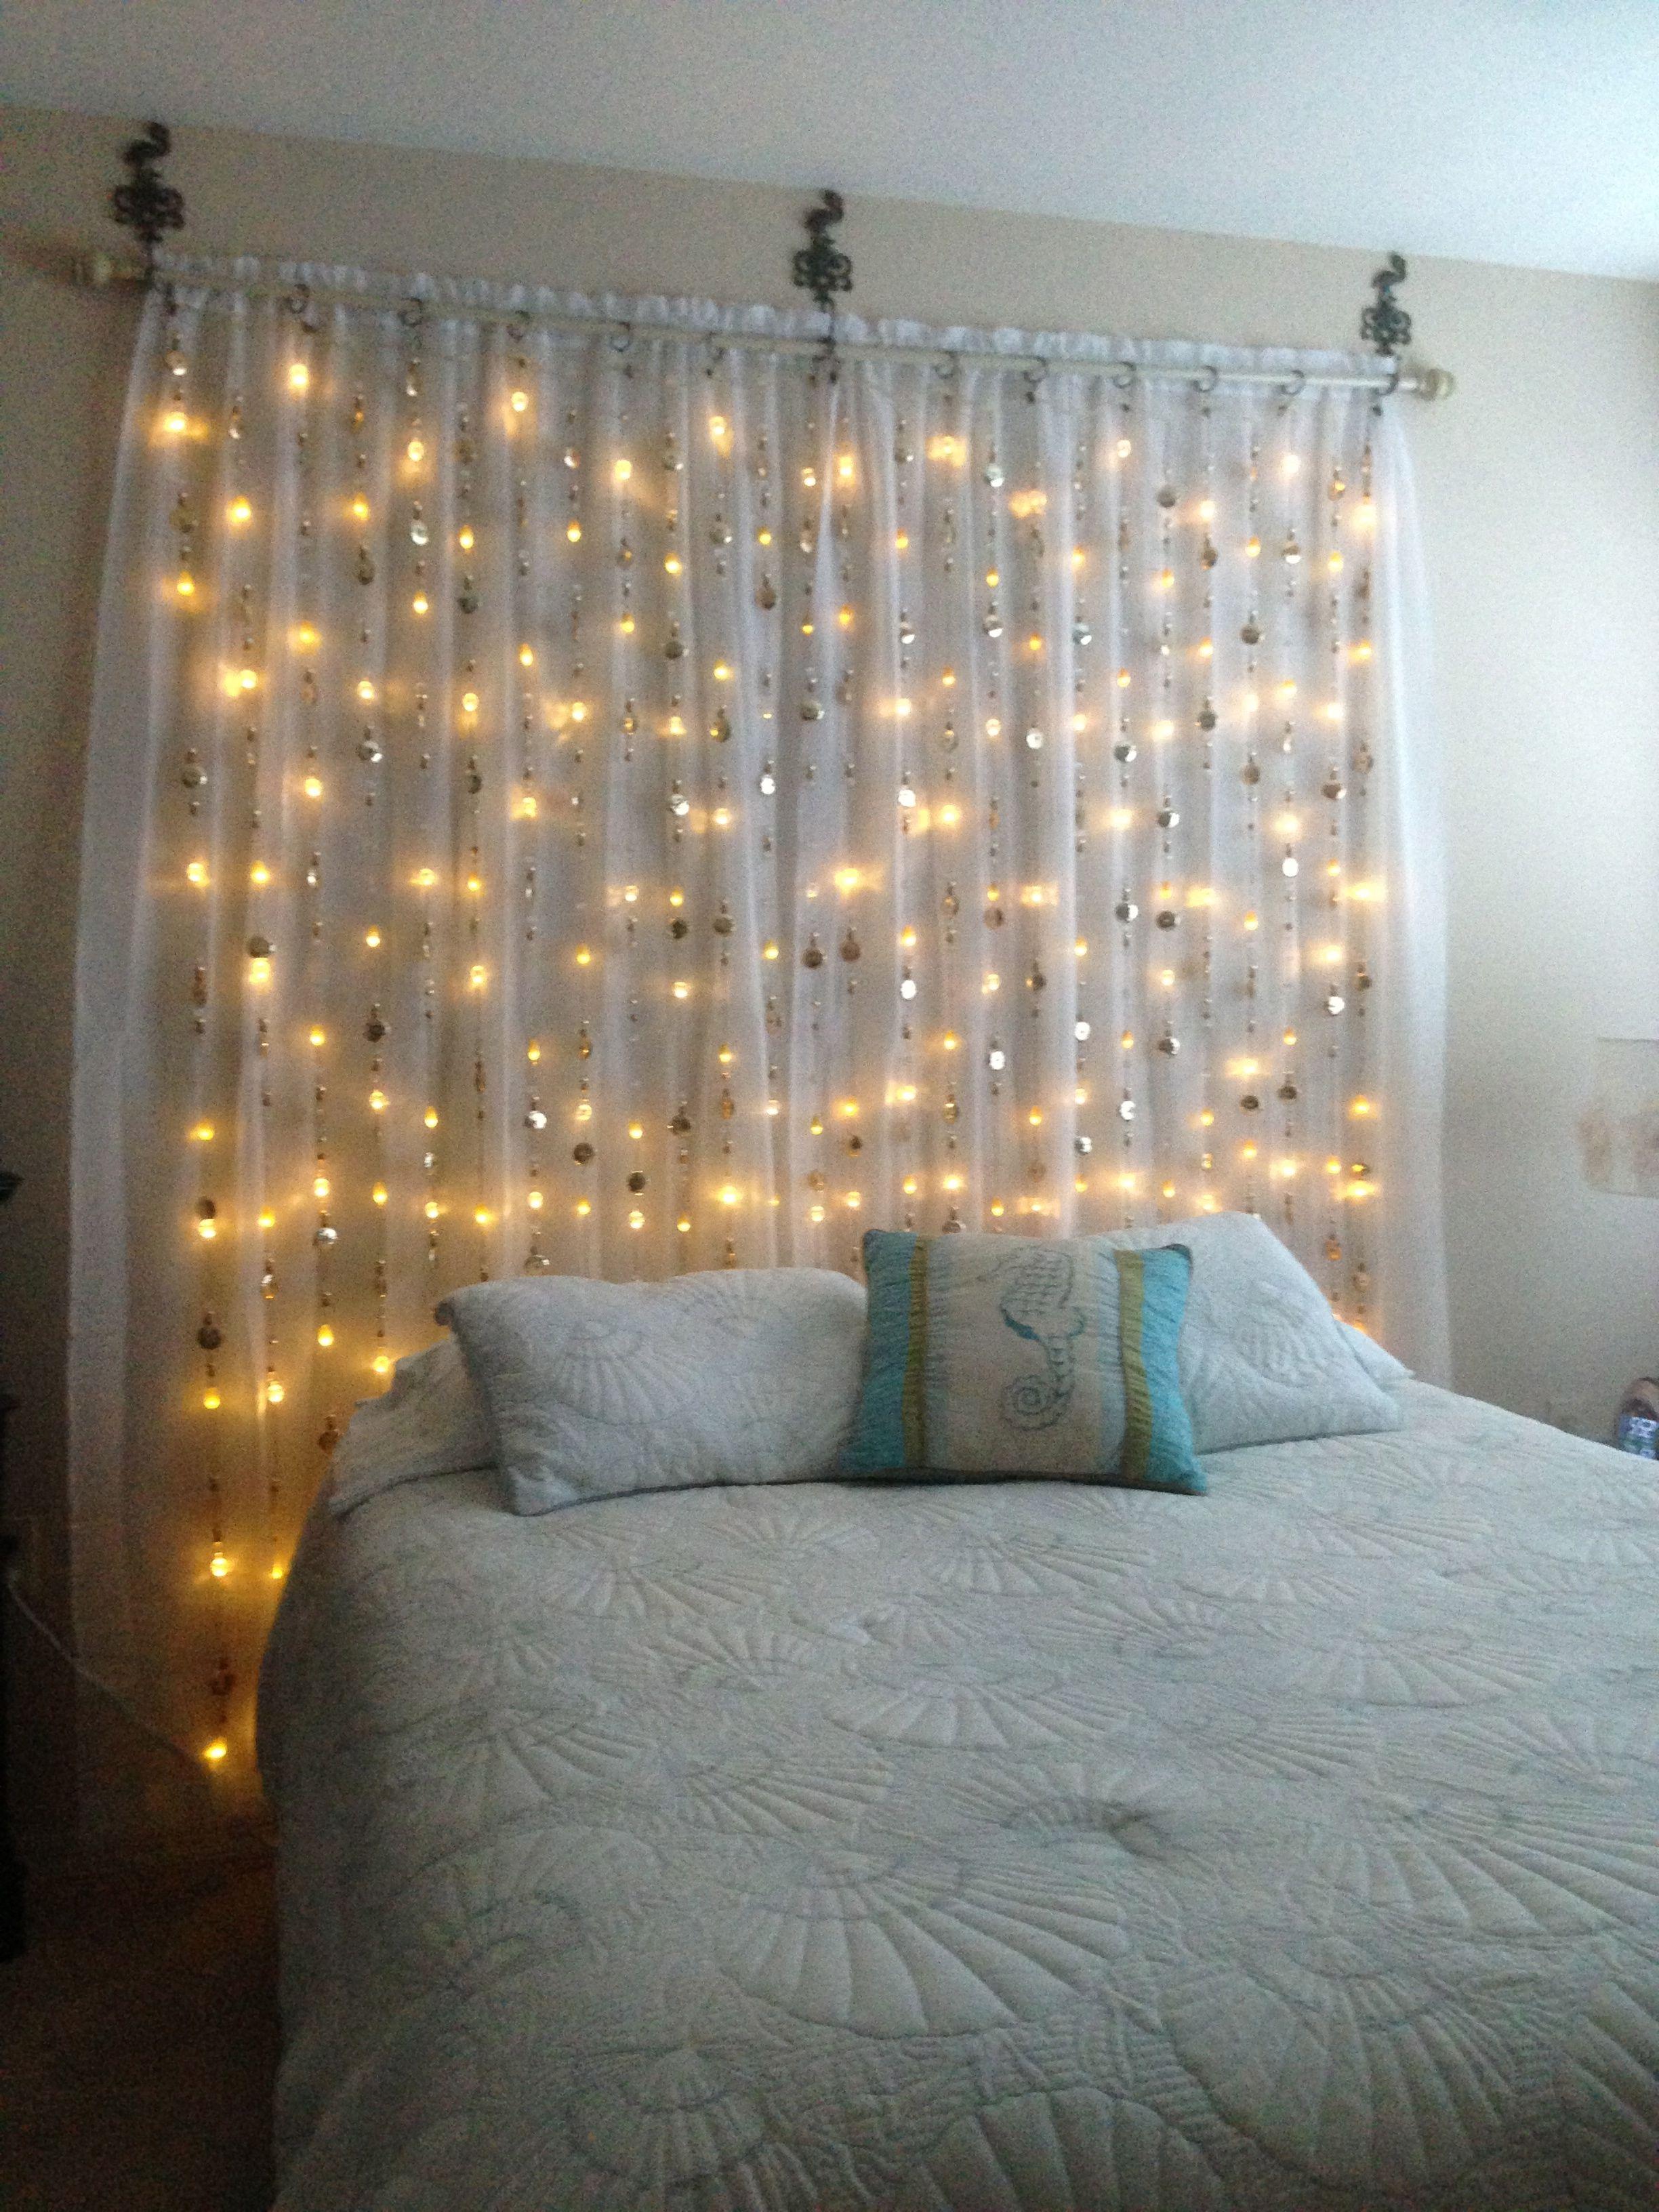 Bedroom String Lights For Girls